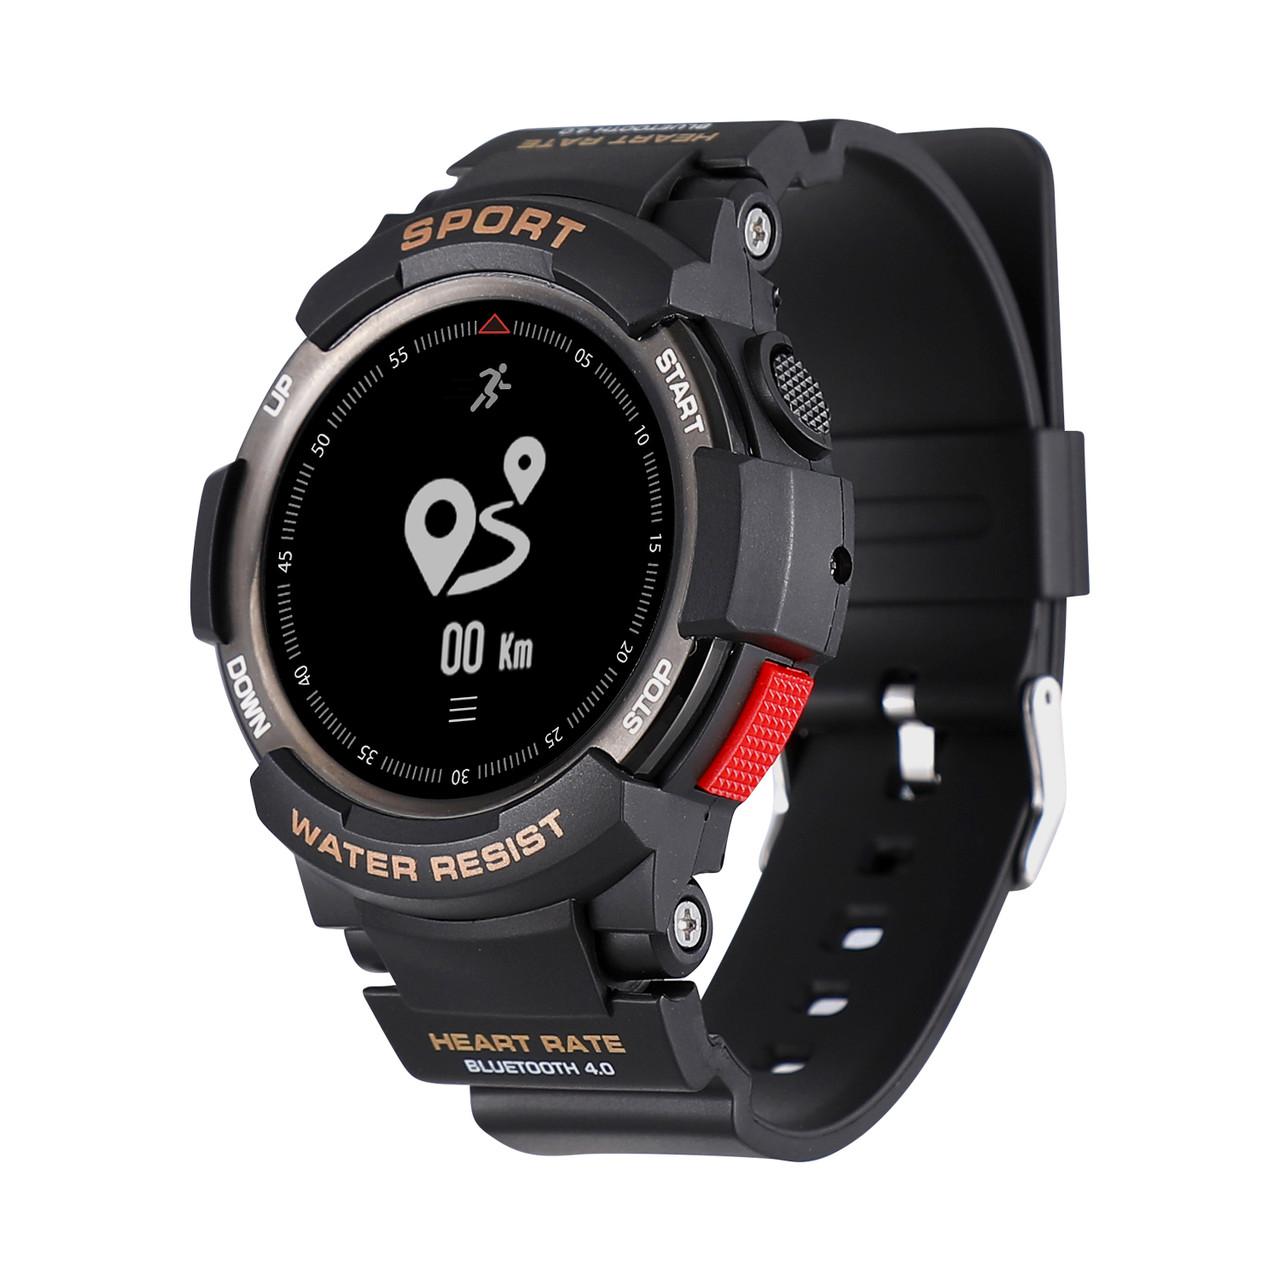 NO.1F60.96inchOLEDДисплей50Days USE Сердце Оценка Монитор 50 метров Водонепроницаемы Sport Smart Watch - 1TopShop